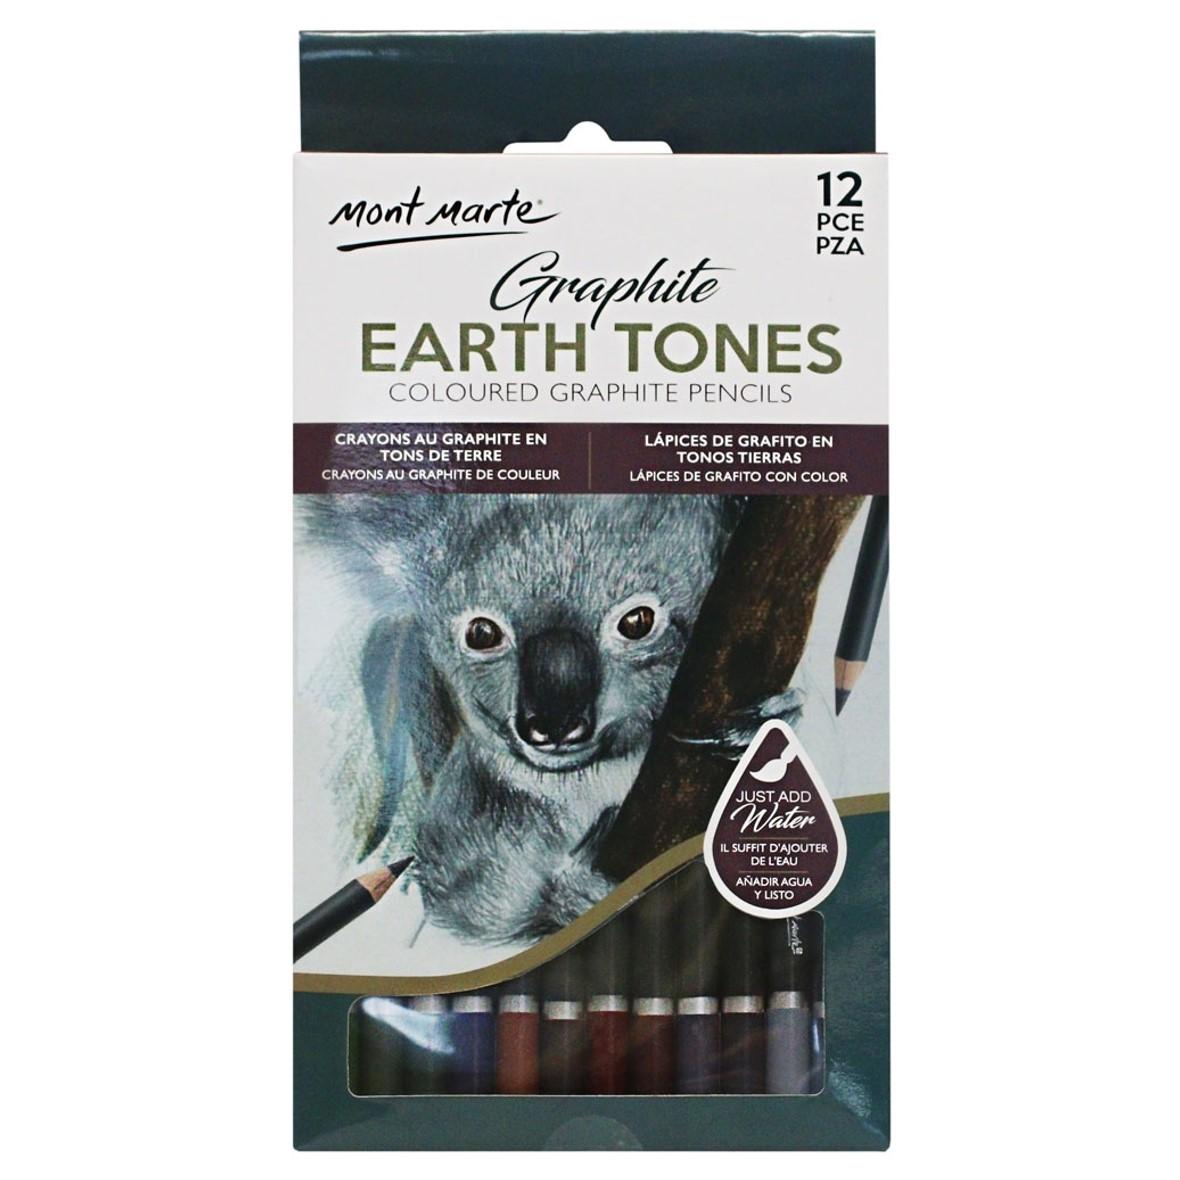 Earth Tones Graphite Pencils